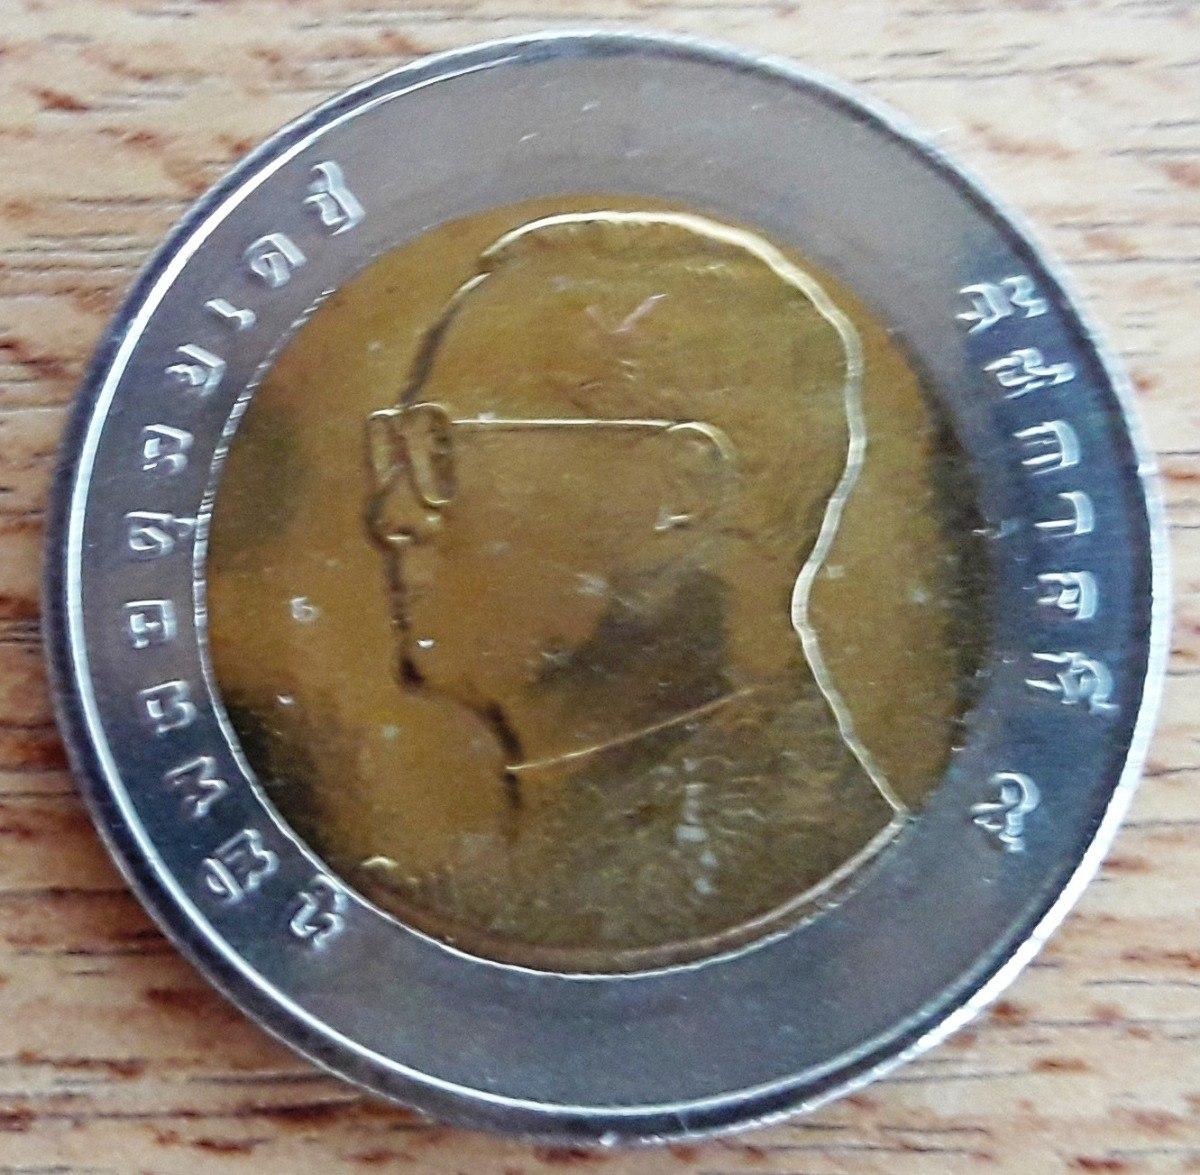 Tailandia Moneda De 10 Bath - Año 2007 - Bimetalica - S/c - $ 50,00 ...